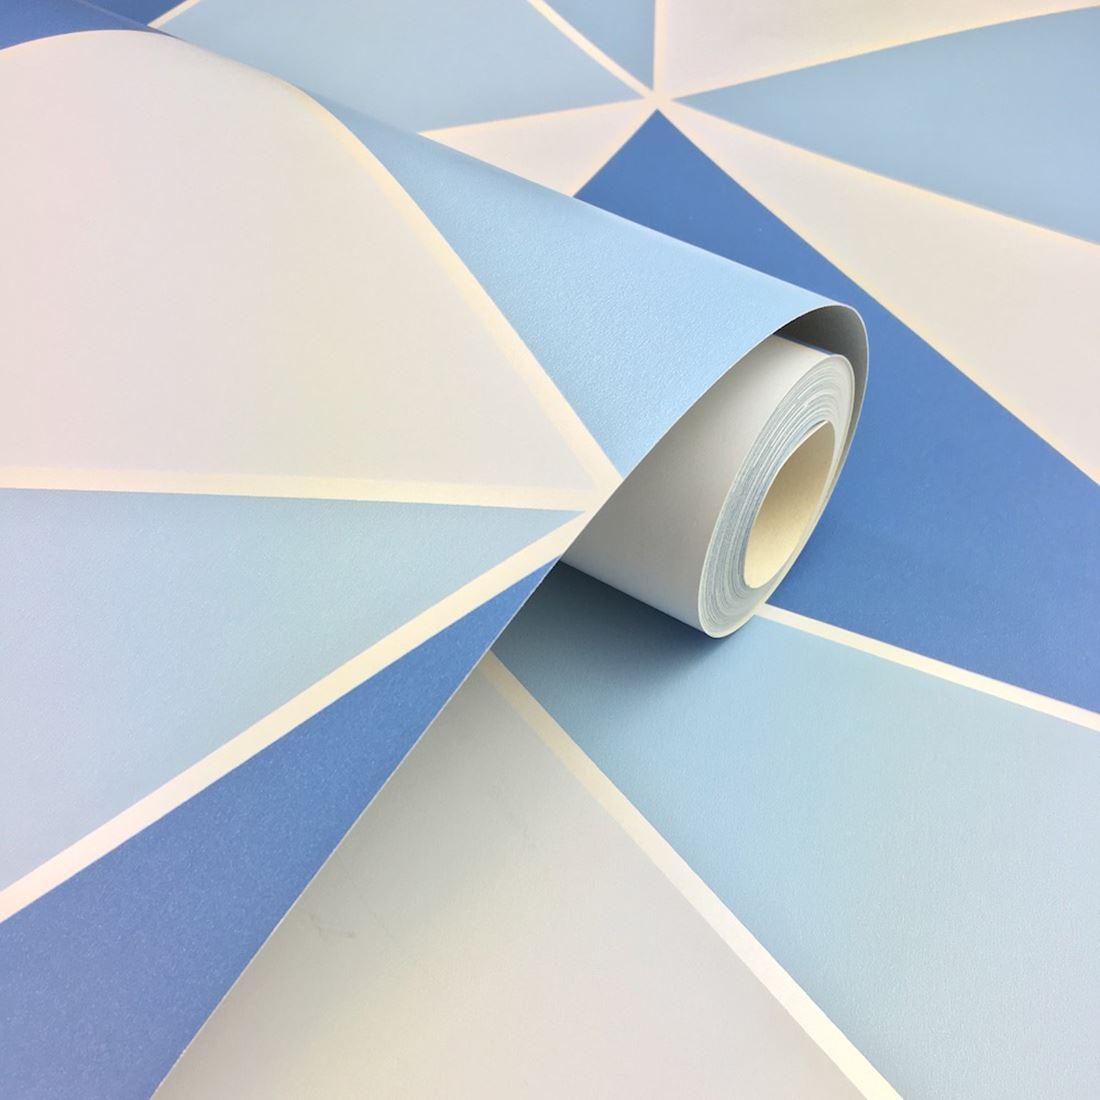 miniatura 8 - Carta da Parati Geometrica Arredamento Camera Moderno Vari Disegni e Colori